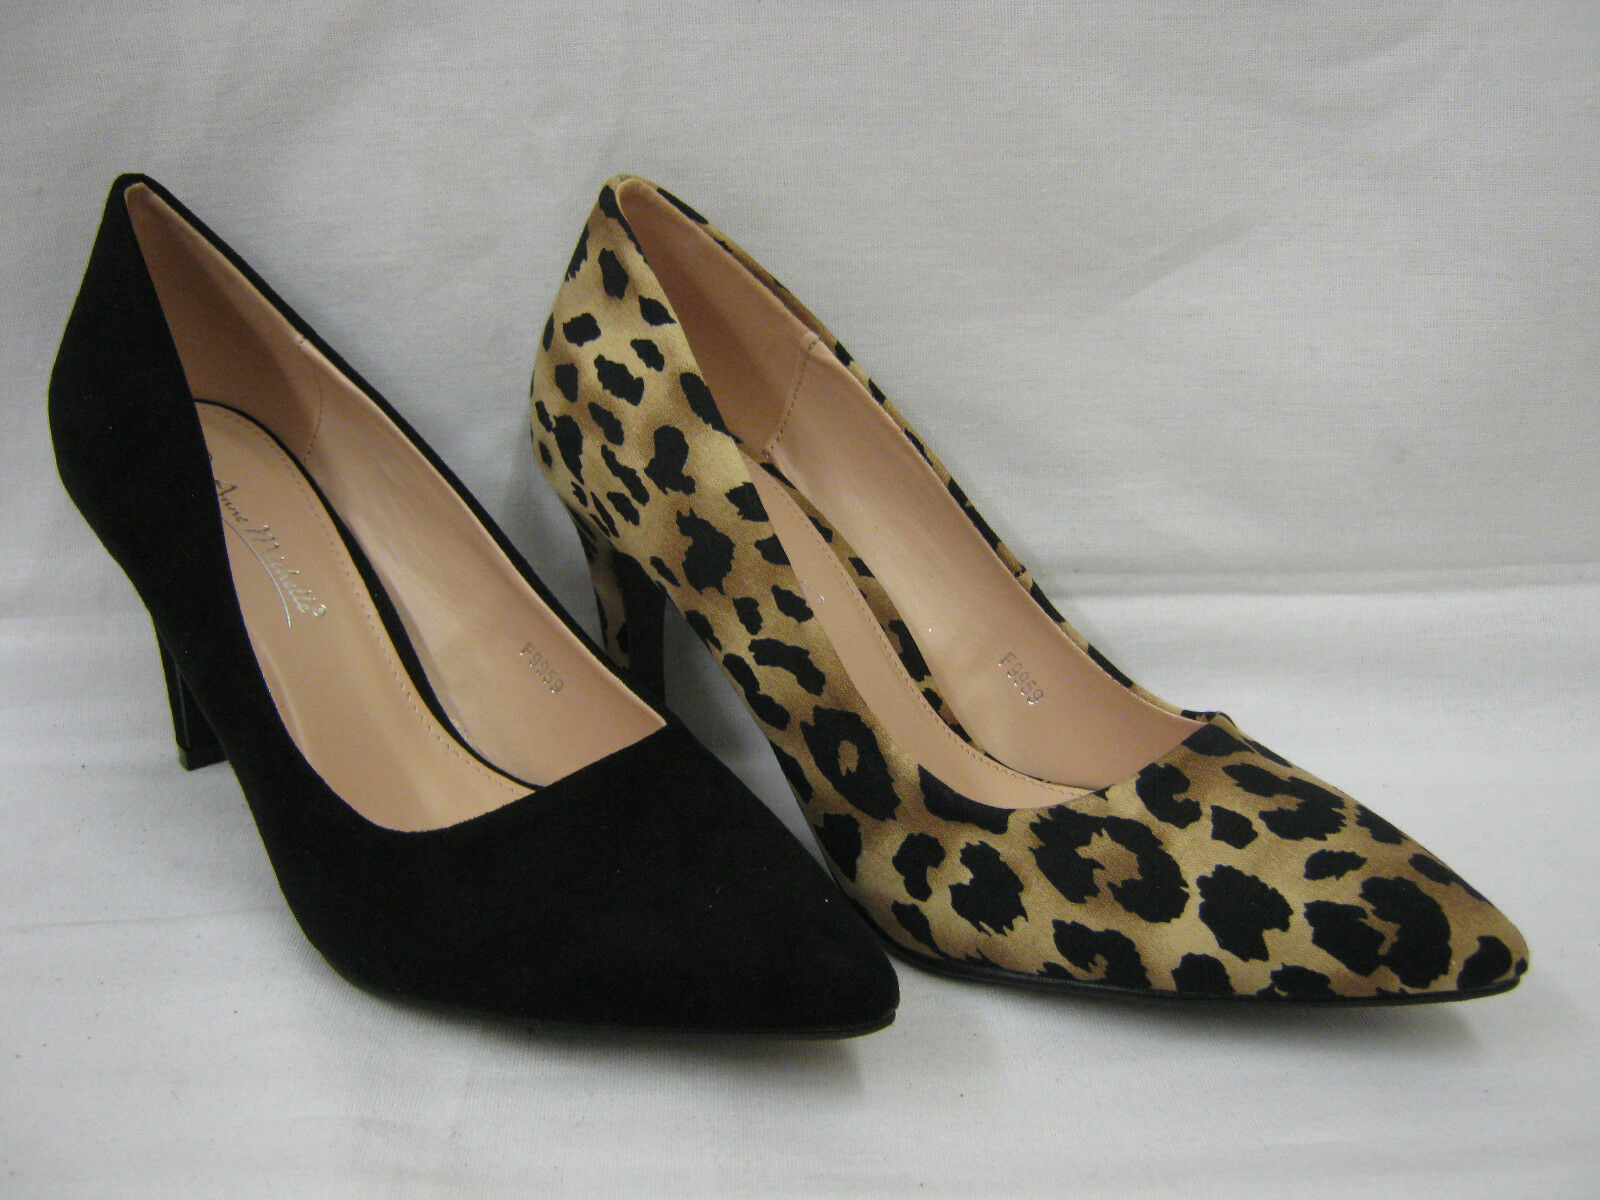 Mujer Anne Michelle Tacón Alto de salón Zapatos con en punta 9959